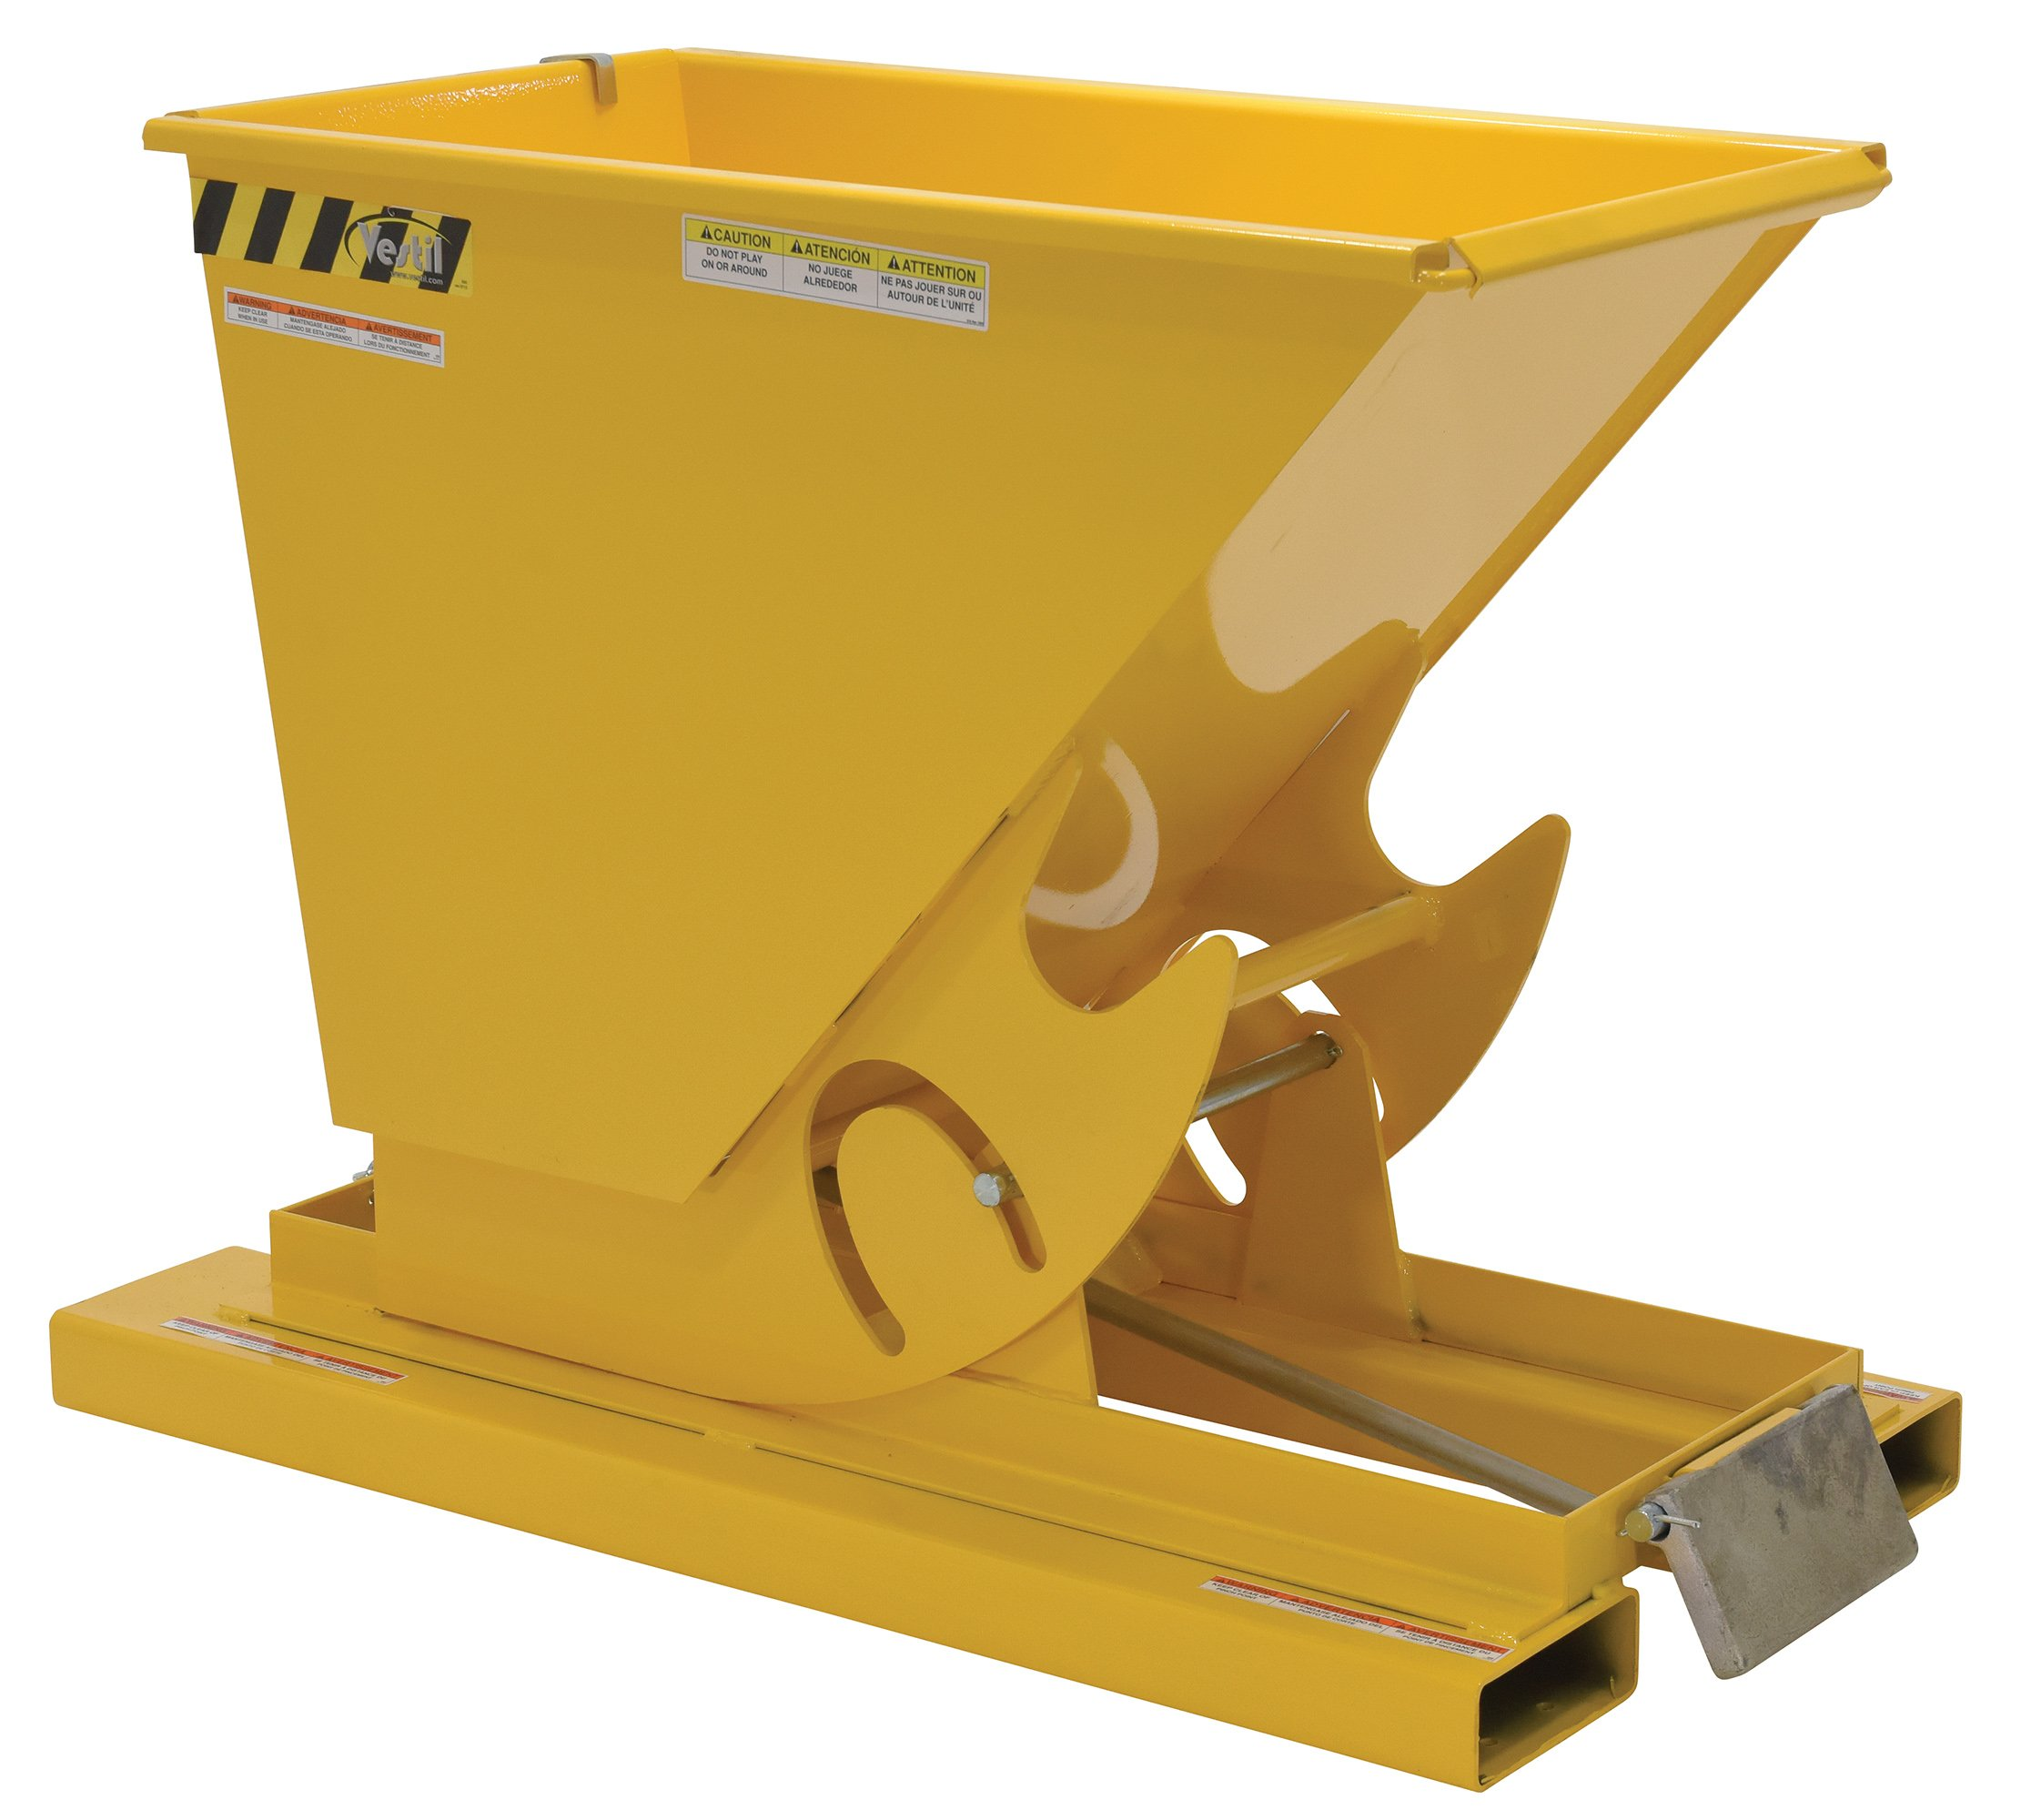 Vestil D-25-MD-YEL Self-Dump MD Hopper, 0.25 cu. yd, 4000 lb. Capacity, Overall L x W x H (in.) 51-7/8'' x 26'' x 38-1/16, Yellow